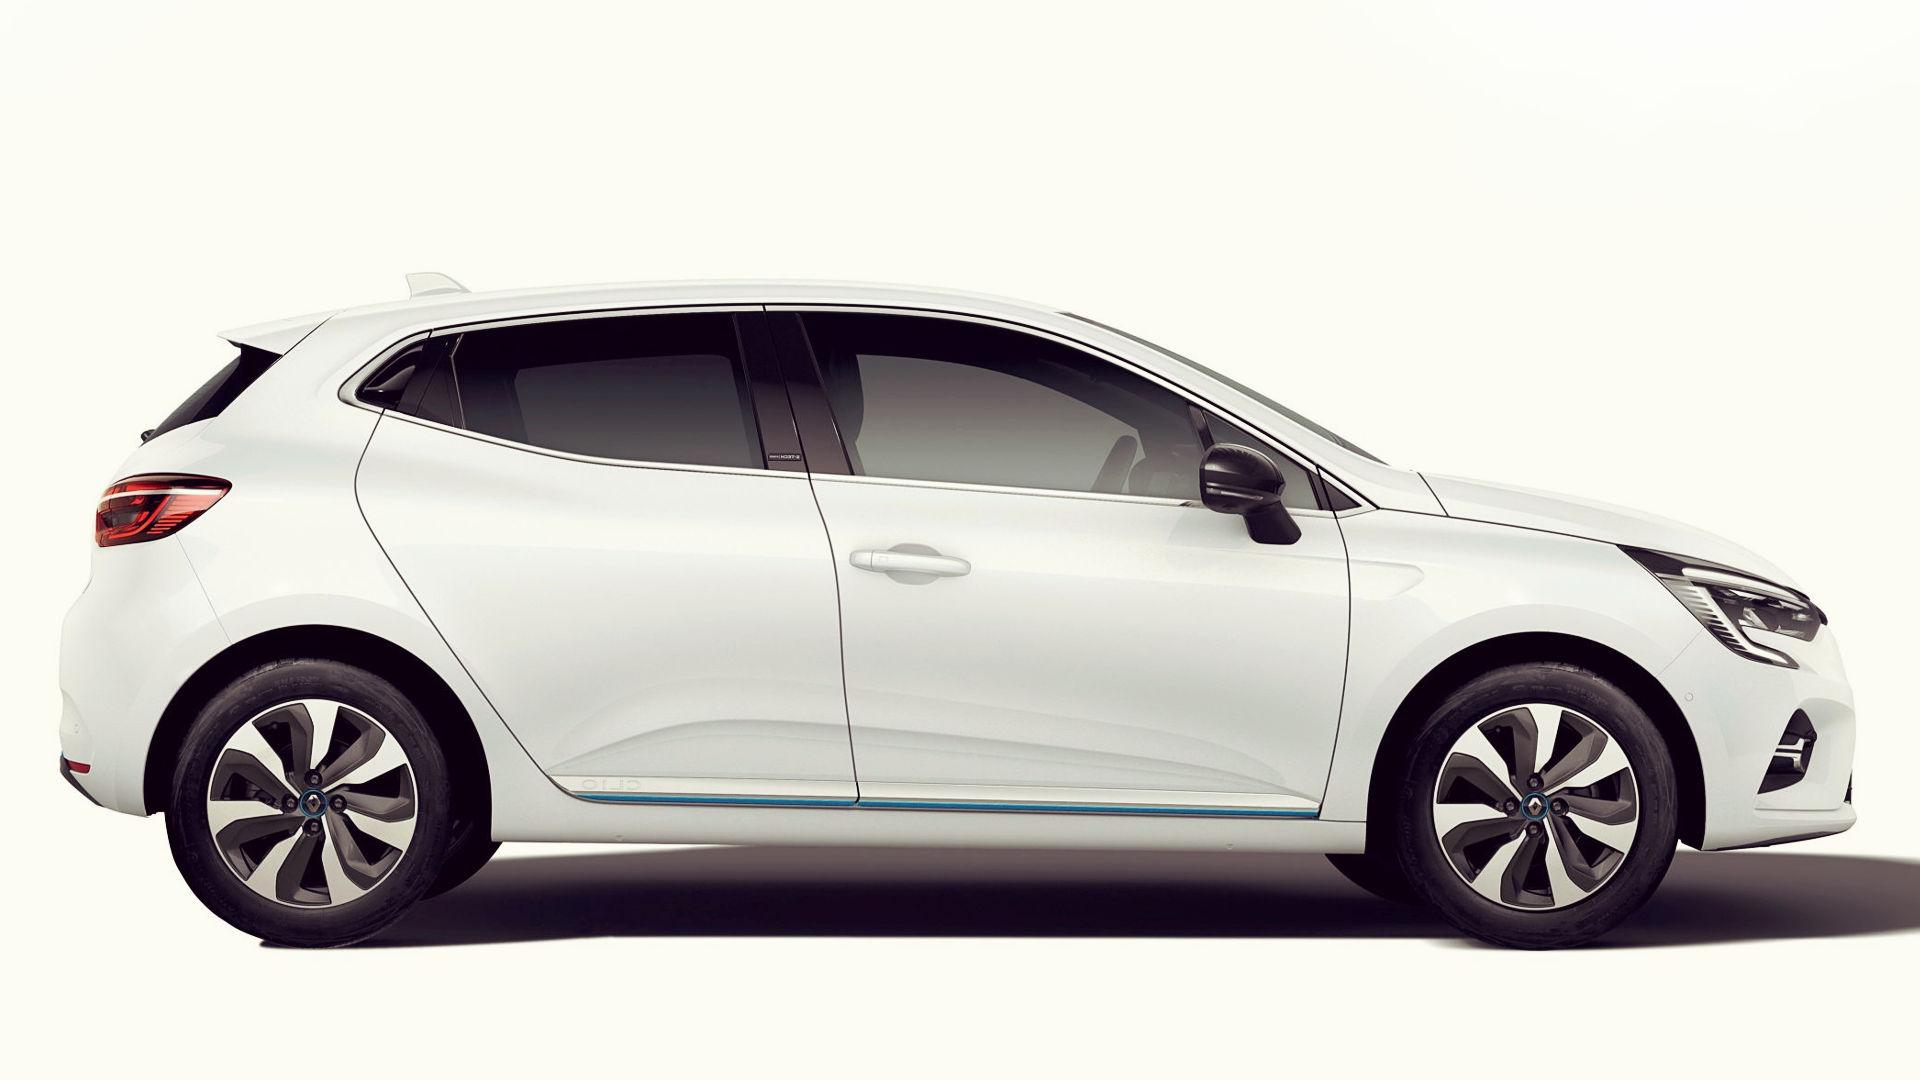 2020 Renault Clio Hybrid E-Tech Wallpaper